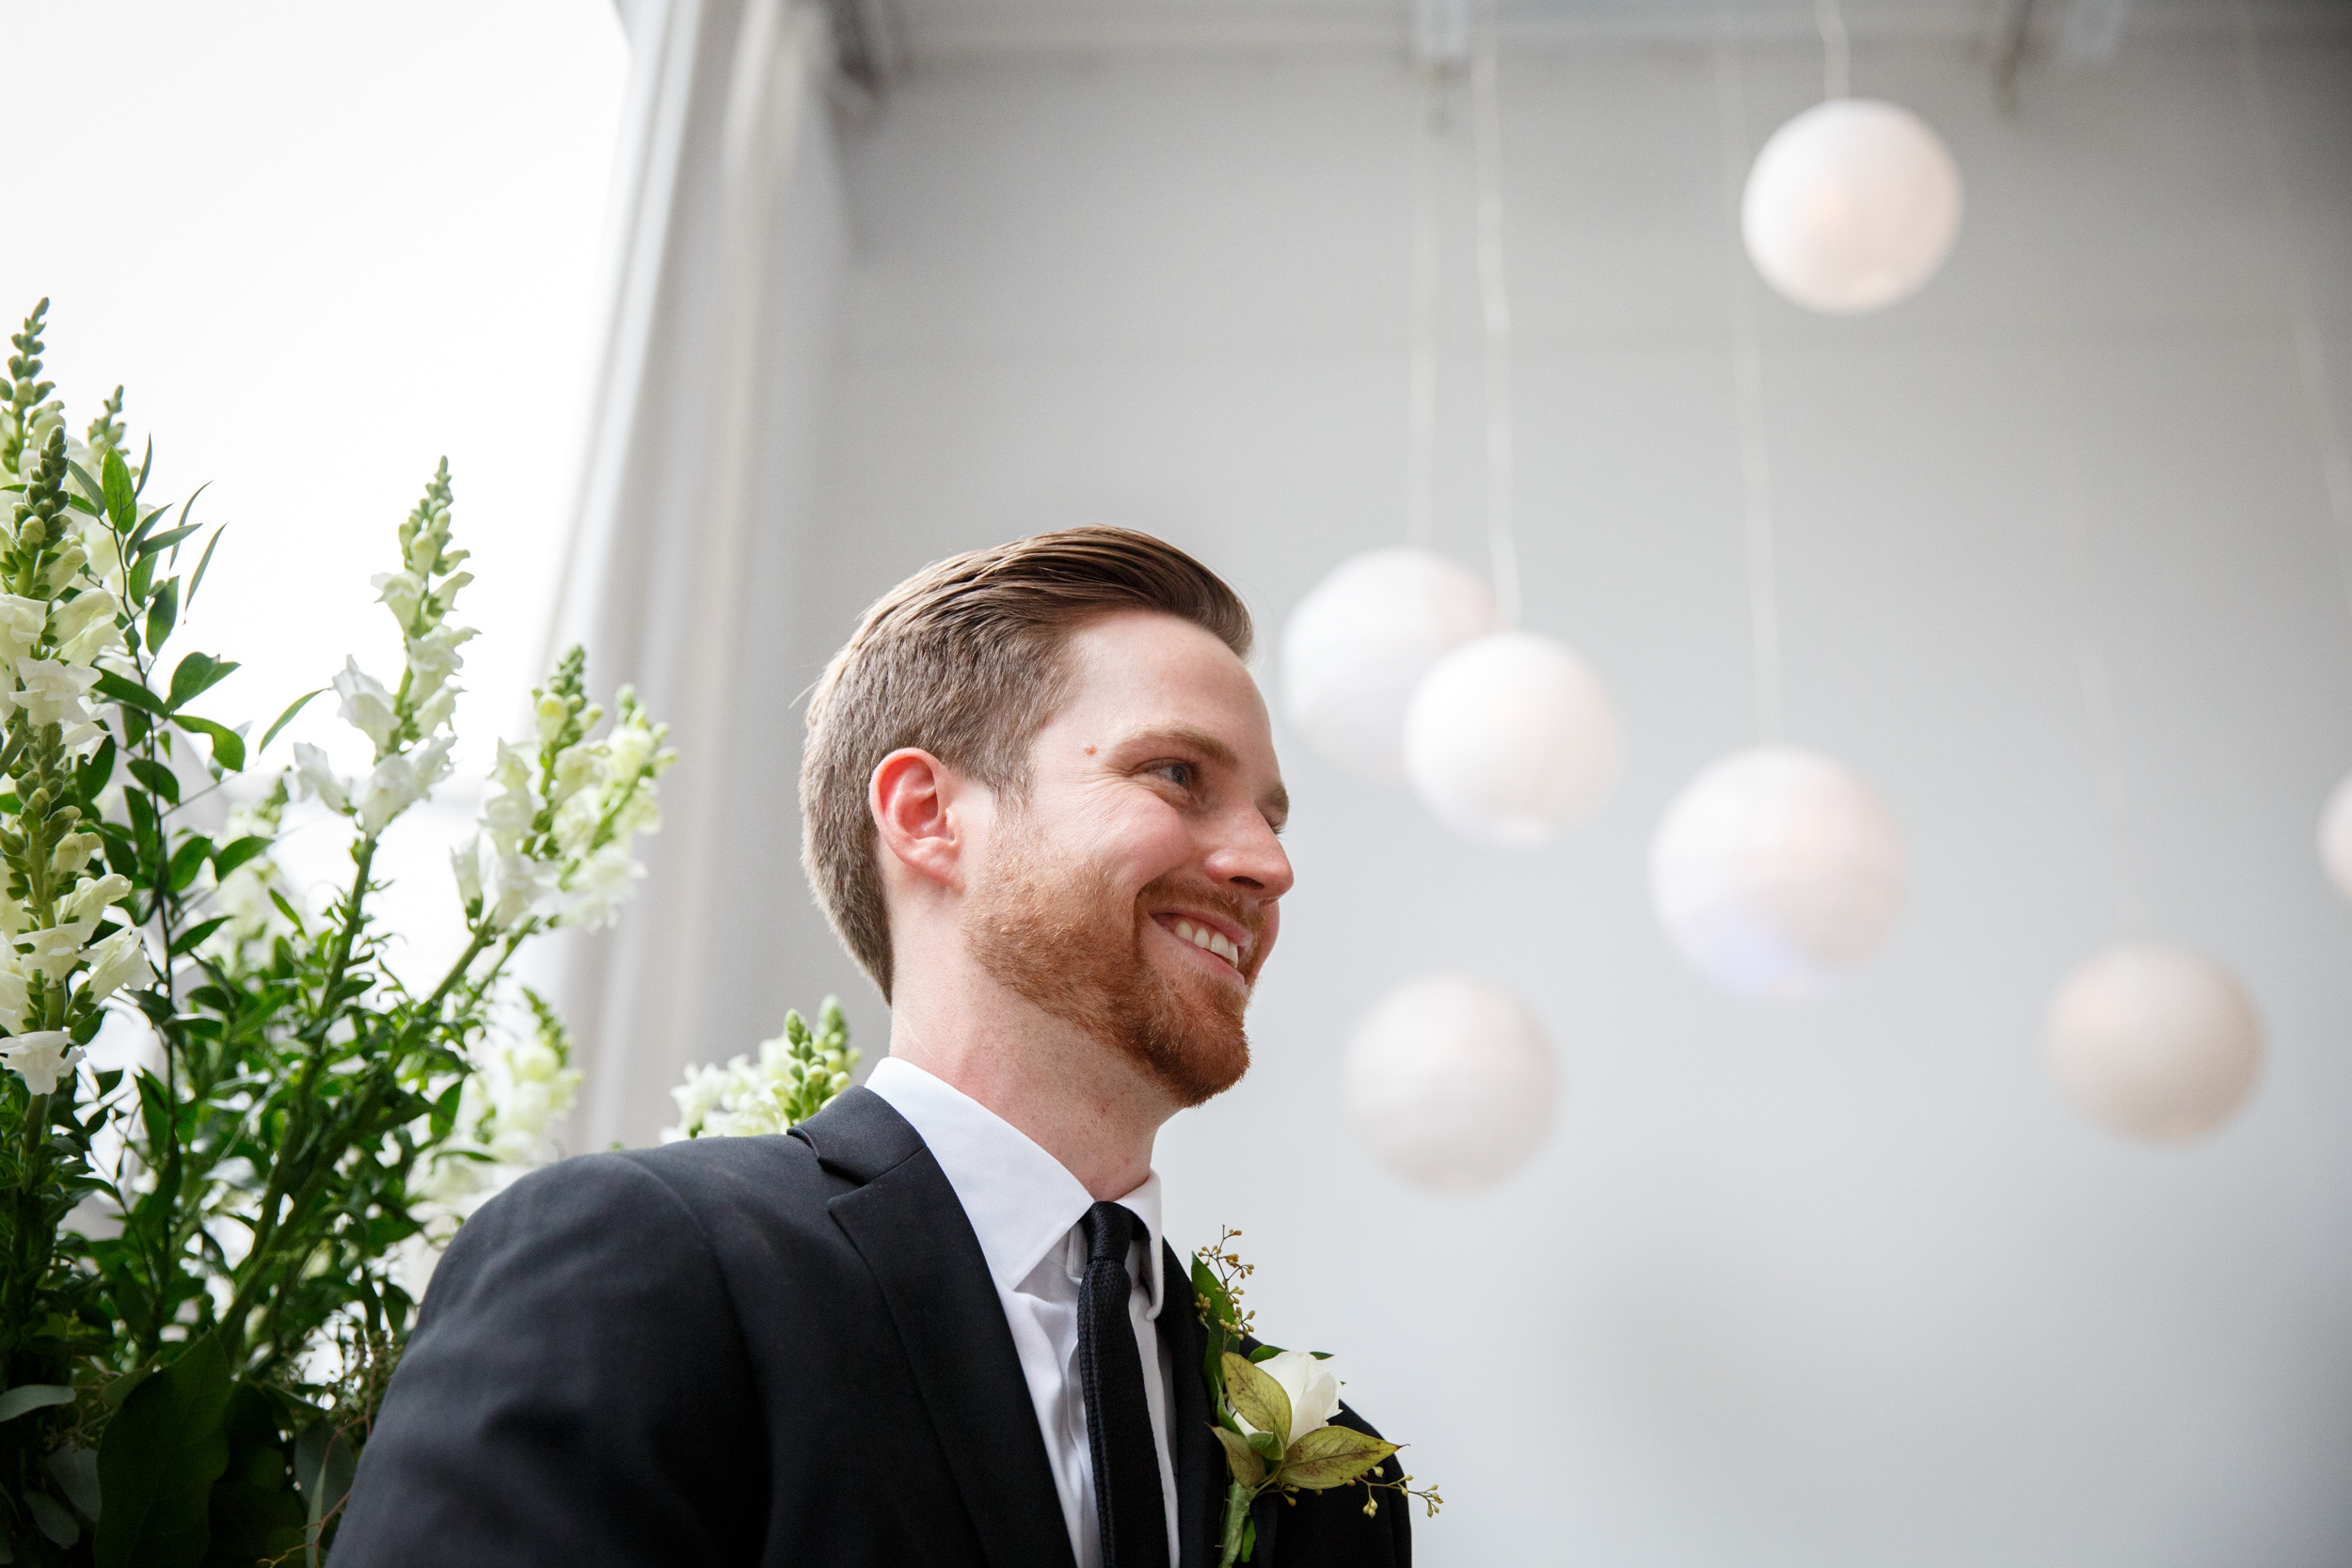 9-09-2016 Flora & Colin wedding photography by Brian Milo-138.jpg